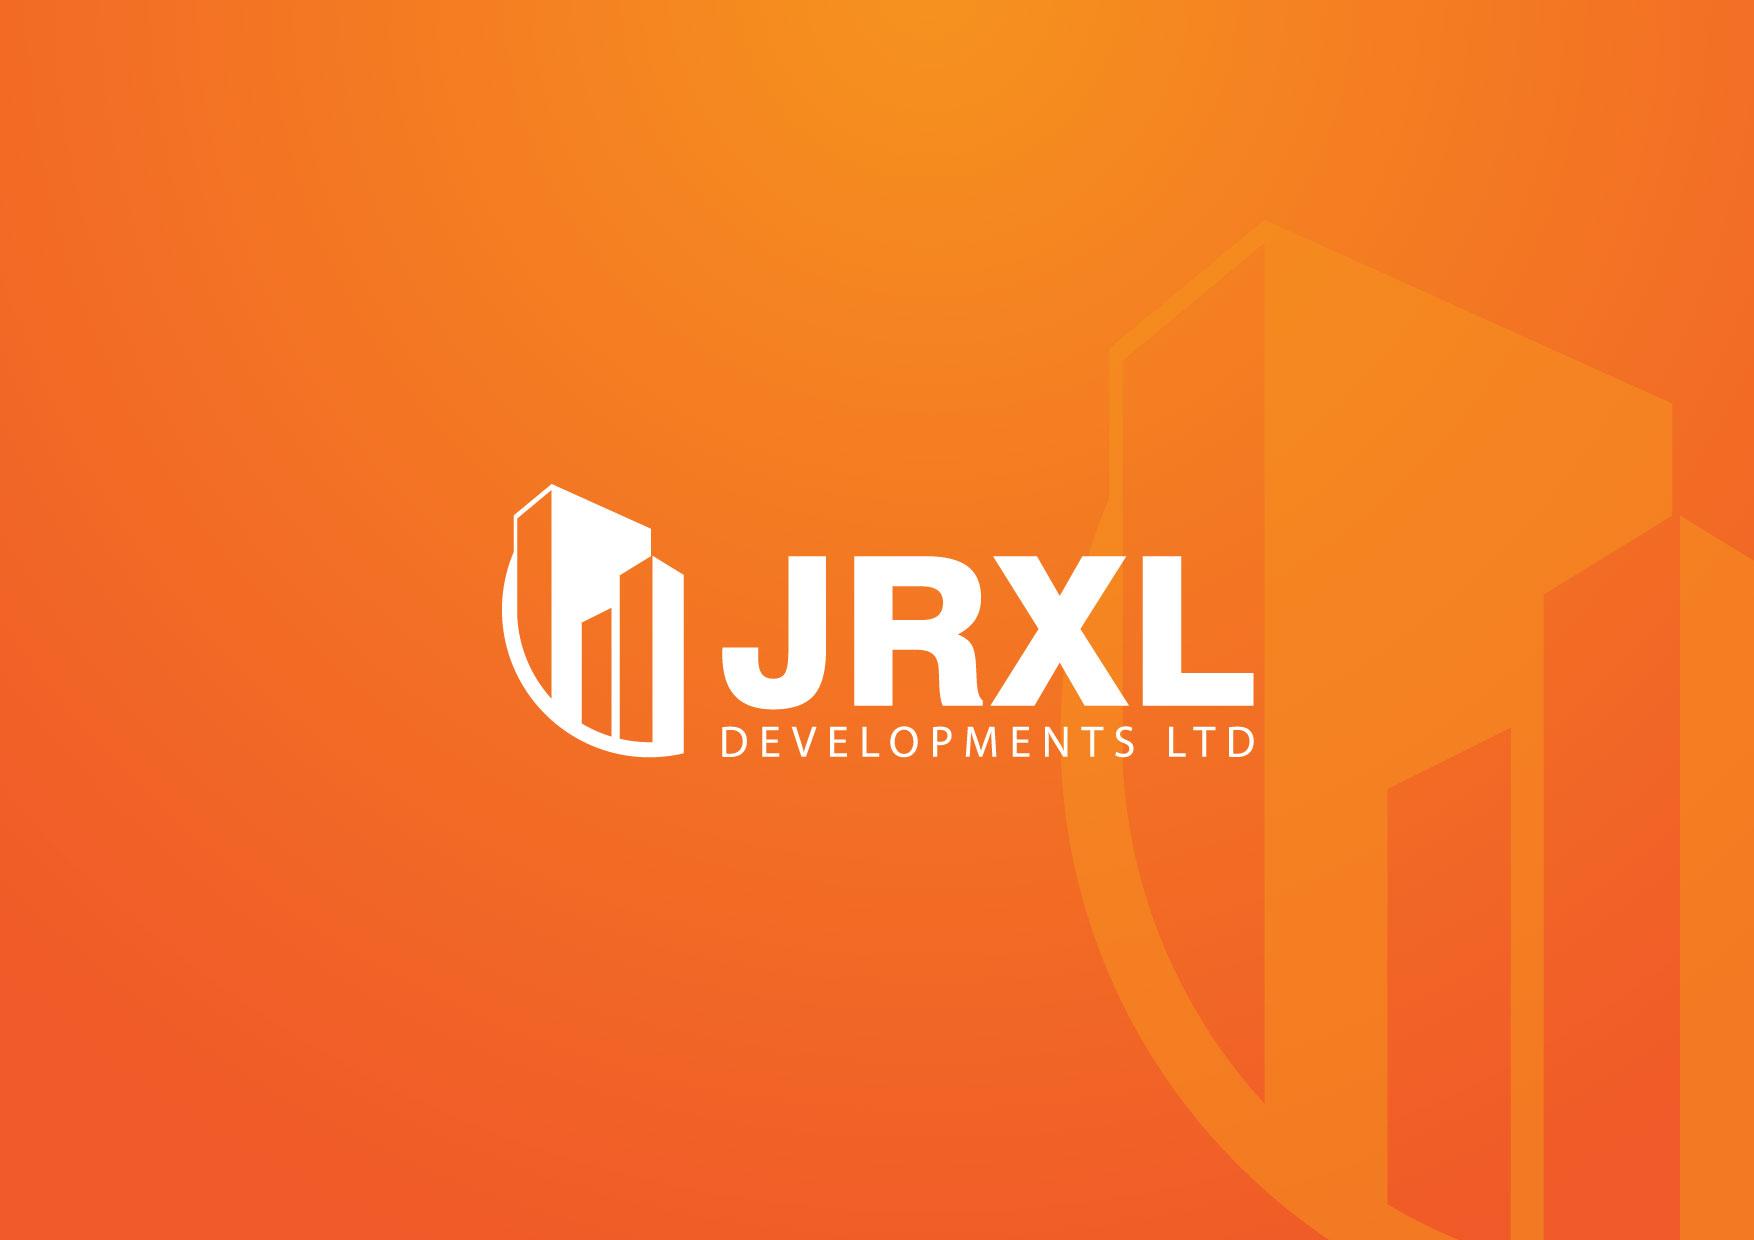 Logo Design by Nurgalih Destianto - Entry No. 32 in the Logo Design Contest JRXL DEVELOPMENTS LTD Logo Design.